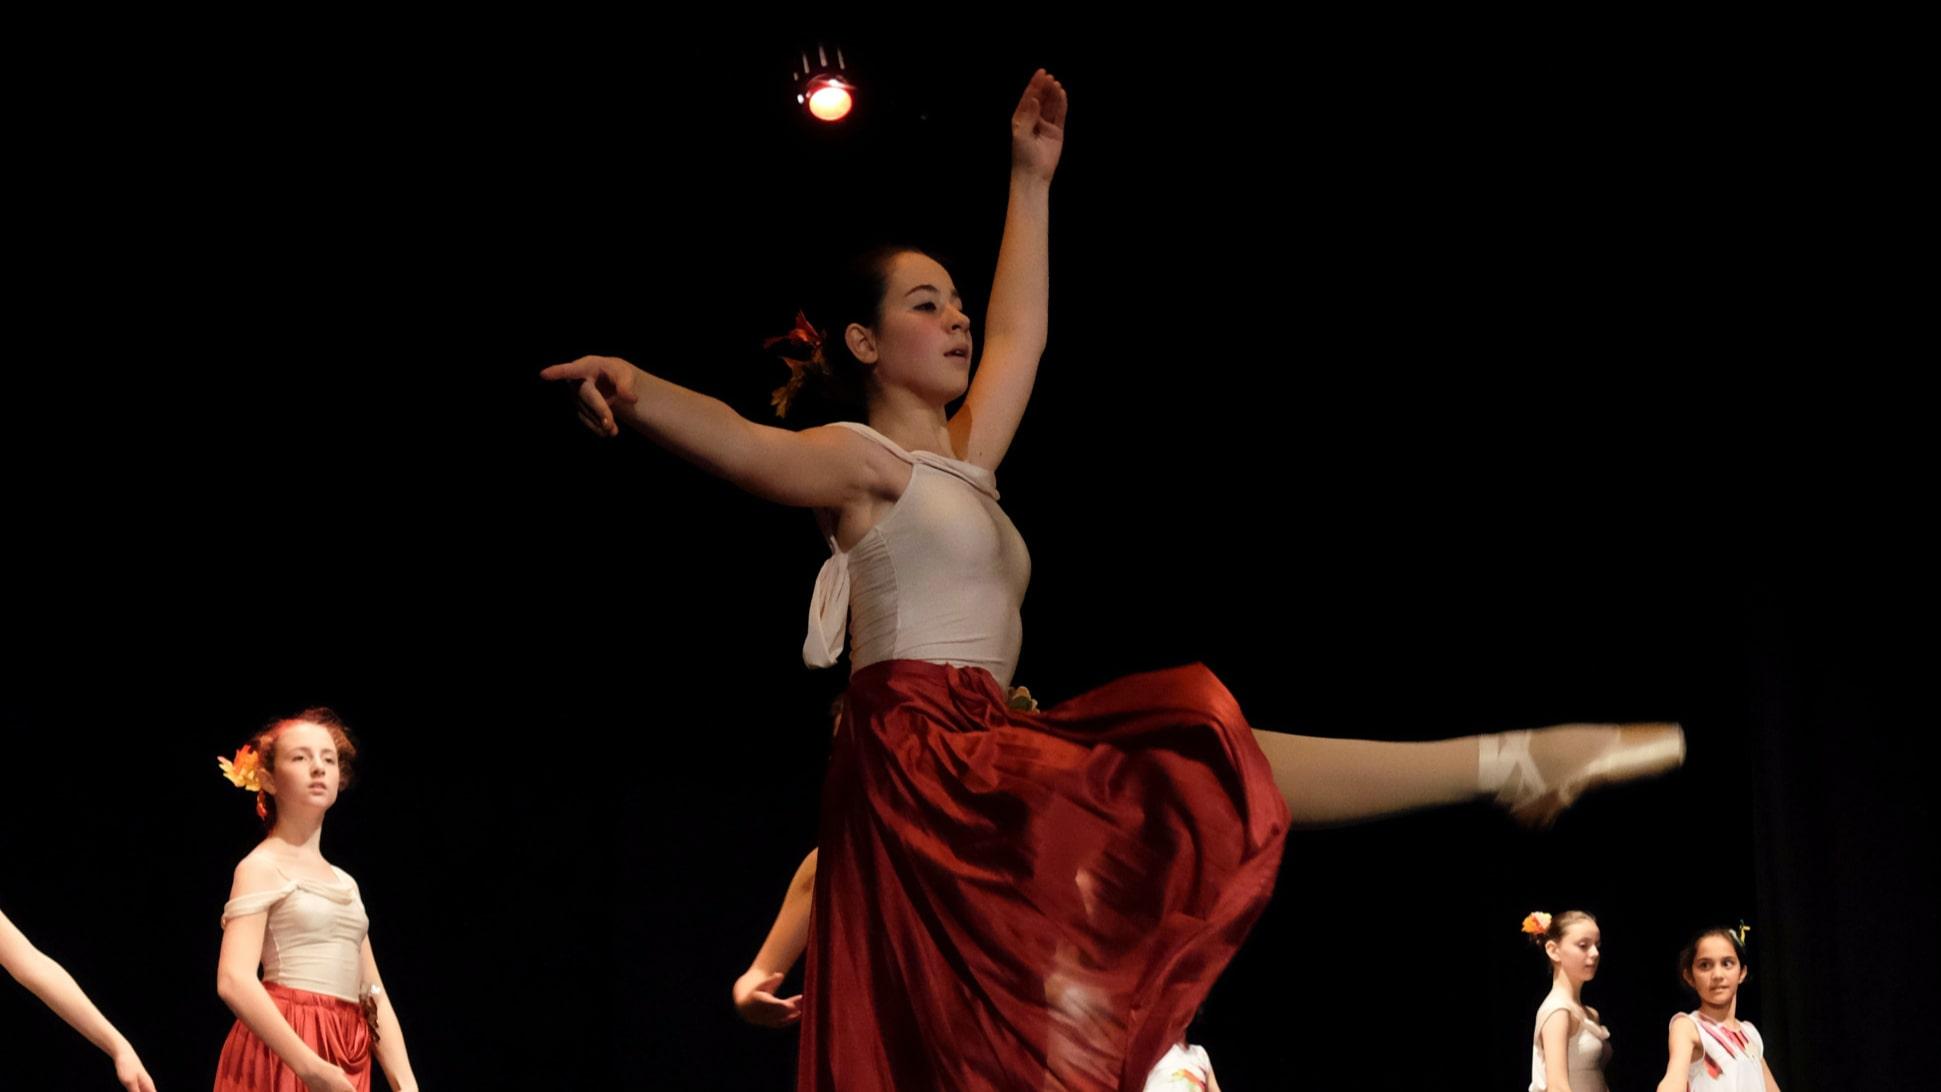 poetar-danzando-25@0.5x